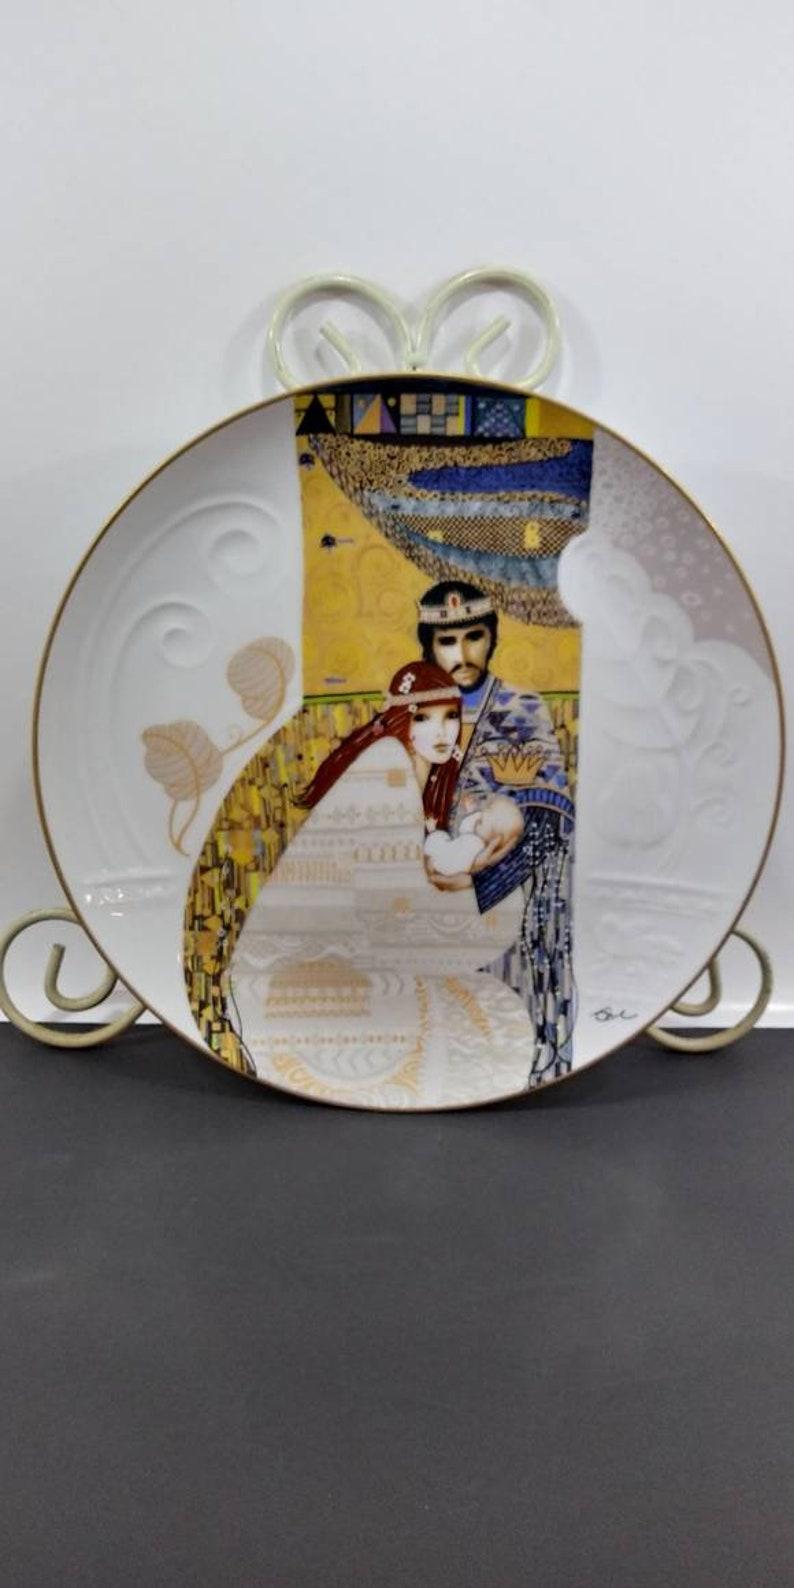 Wall Decor Bathsheba and Solomon Plate Collectible Plate